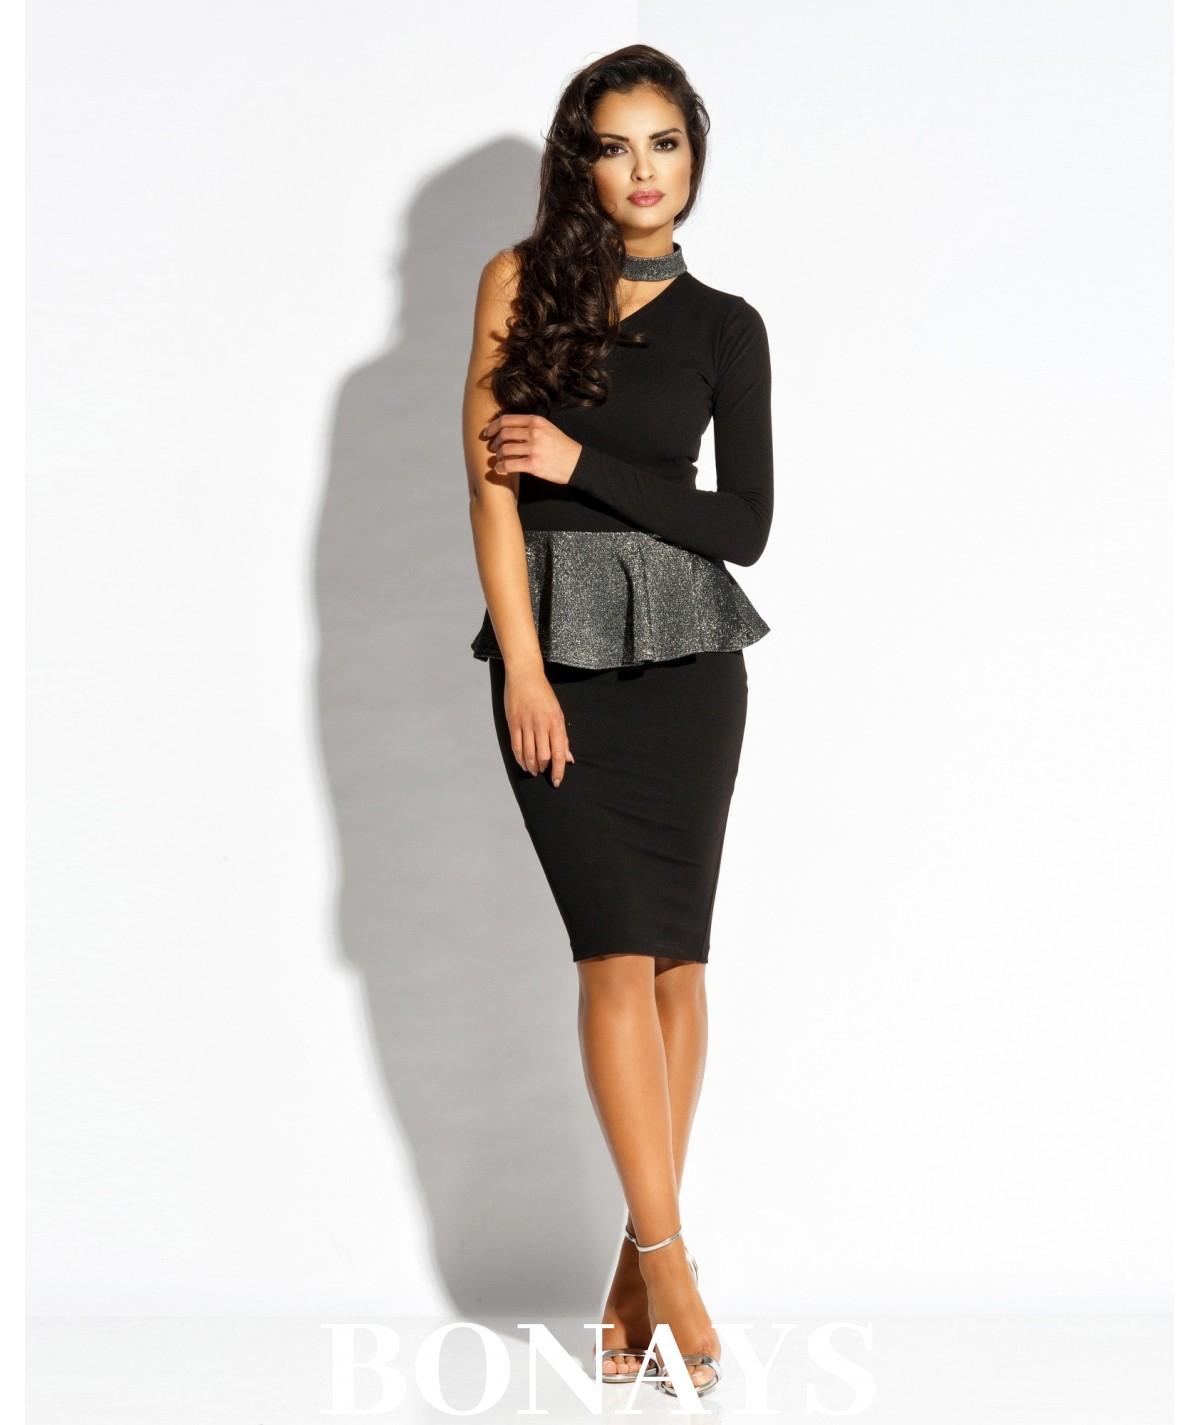 czarna sukienka ze srebrną baskinką Dursi